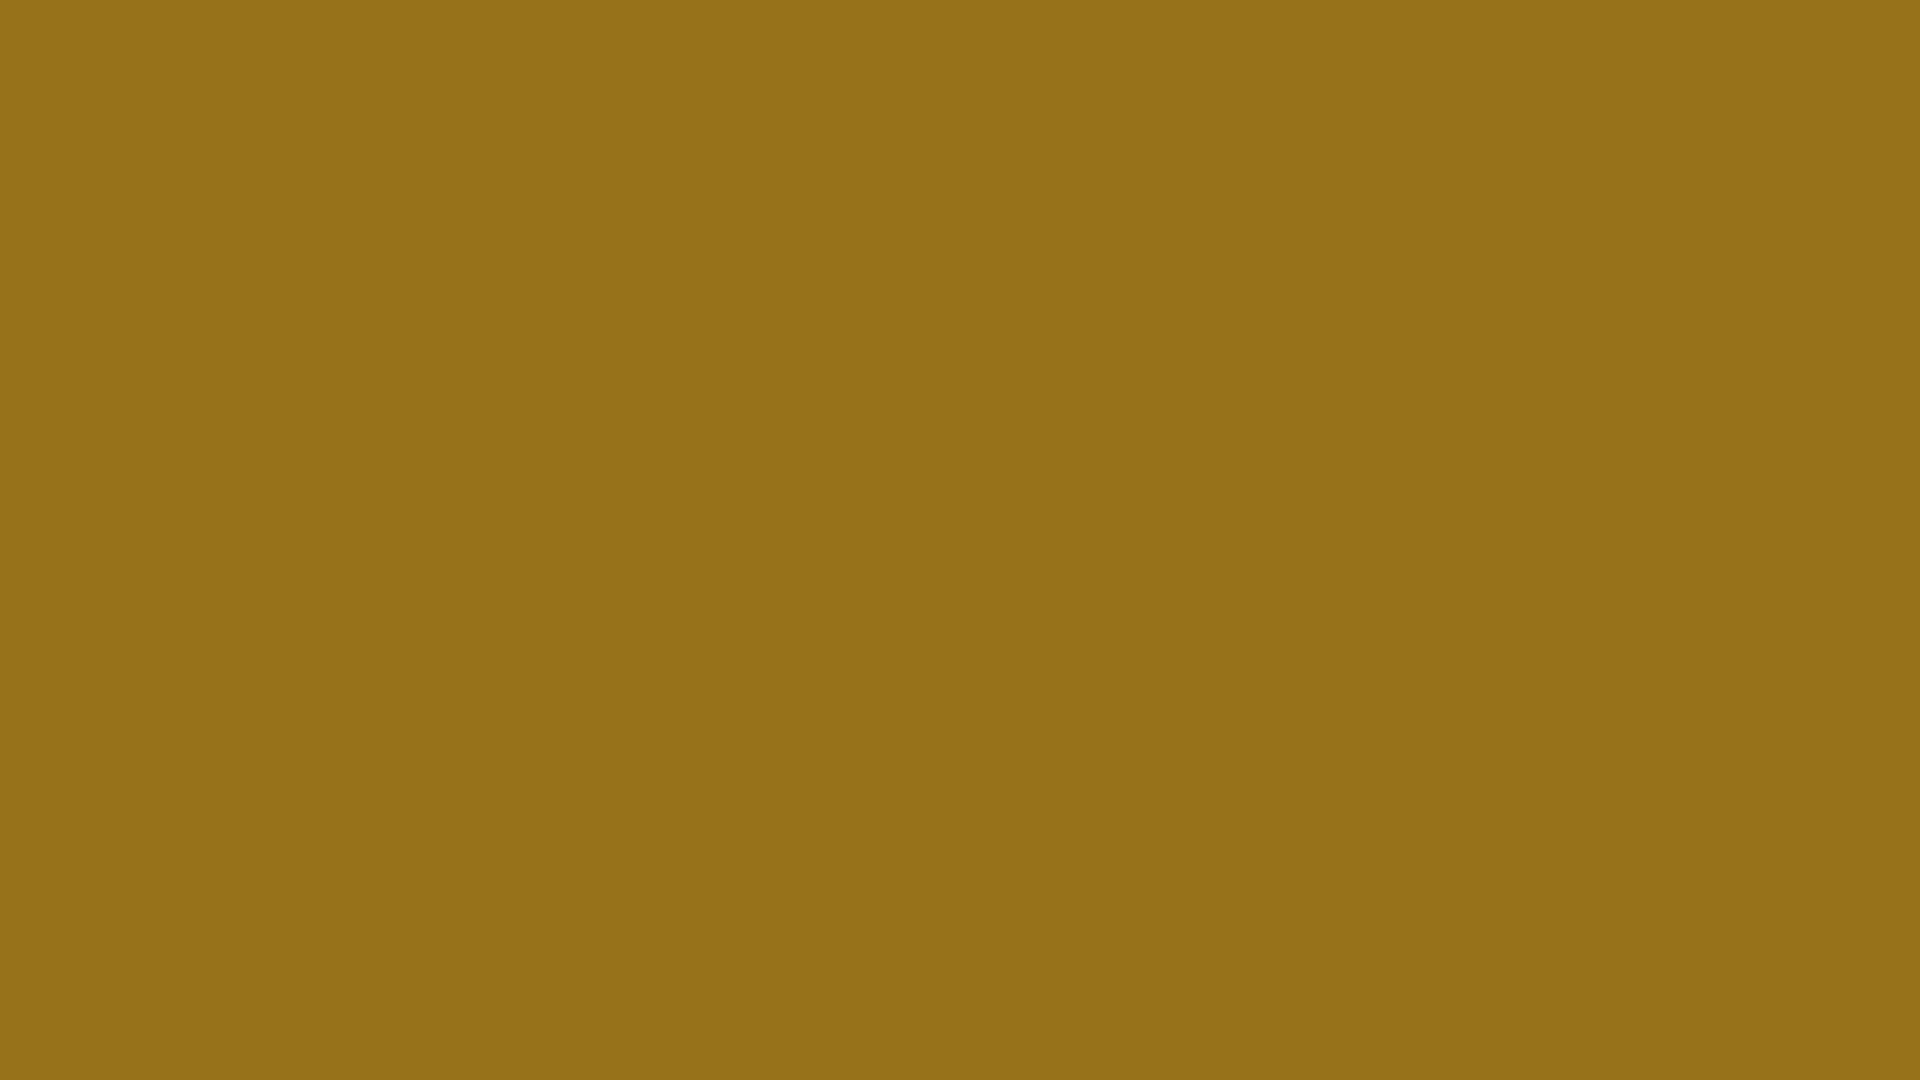 1920x1080 Bistre Brown Solid Color Background